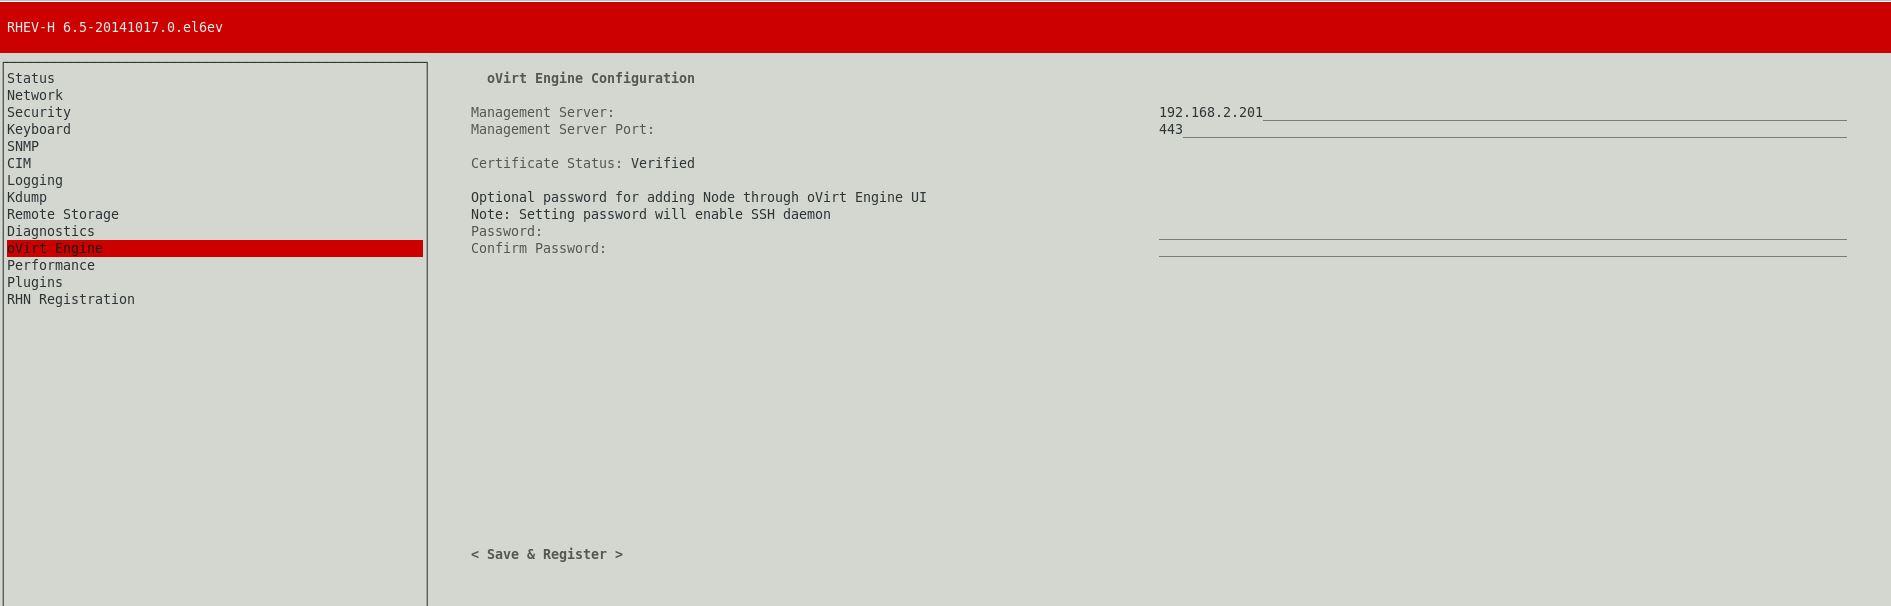 Red Hat Enterprise Virtualization (RHEV) Home Lab